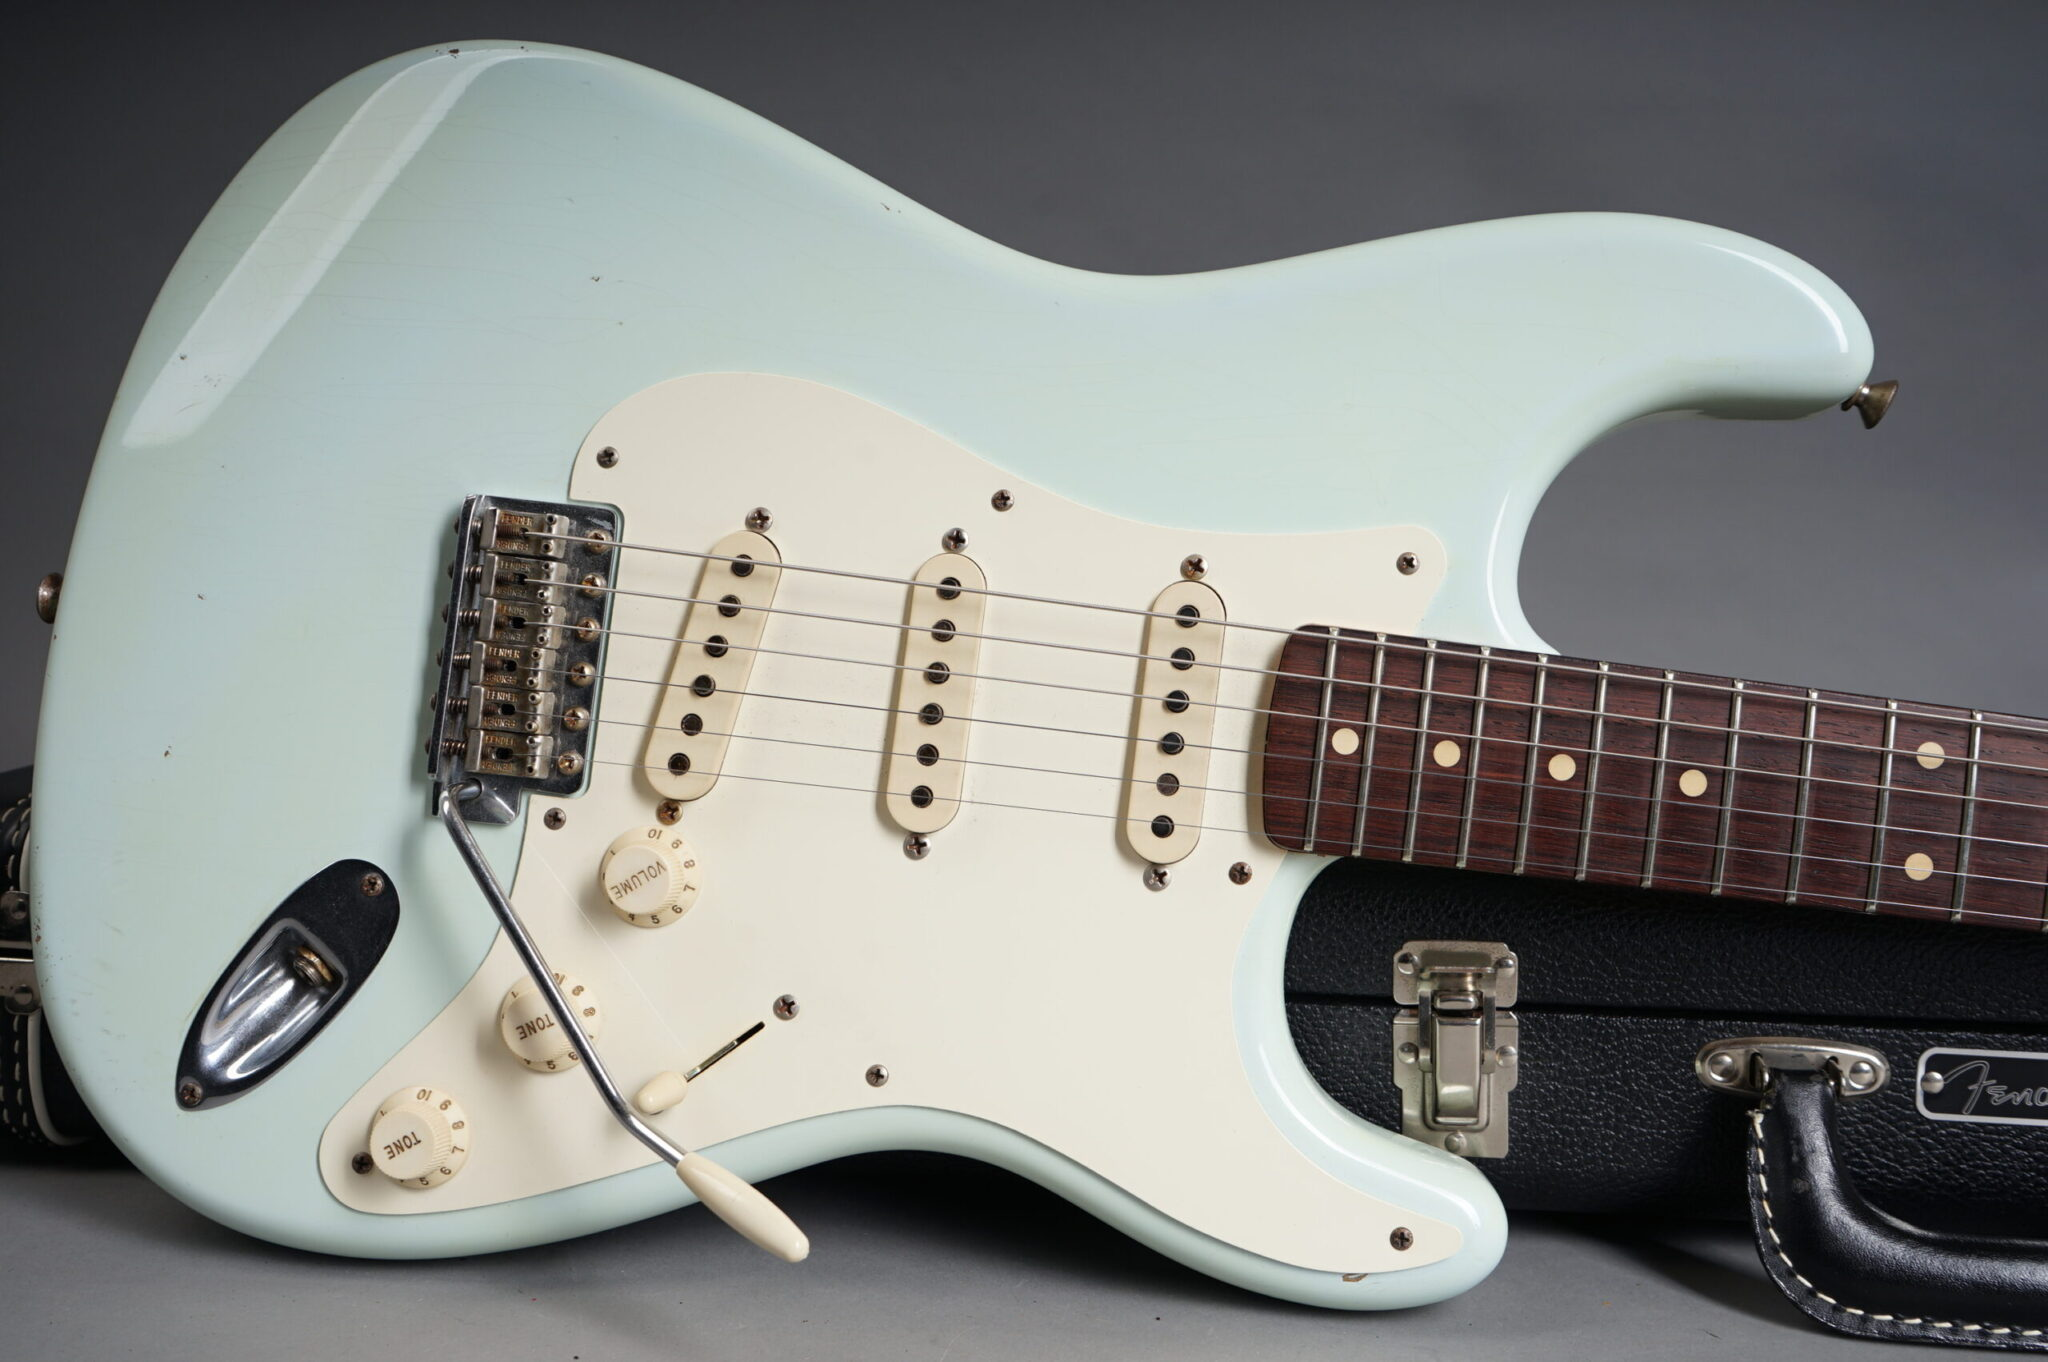 https://guitarpoint.de/app/uploads/products/2005-fender-john-english-masterbuilt-1959-stratocaster-sonic-blue-relic/2005-Fender-John-English-Masterbuilt-1959-Stratocaster-Sonic-Blue-8-1-scaled-2048x1362.jpg